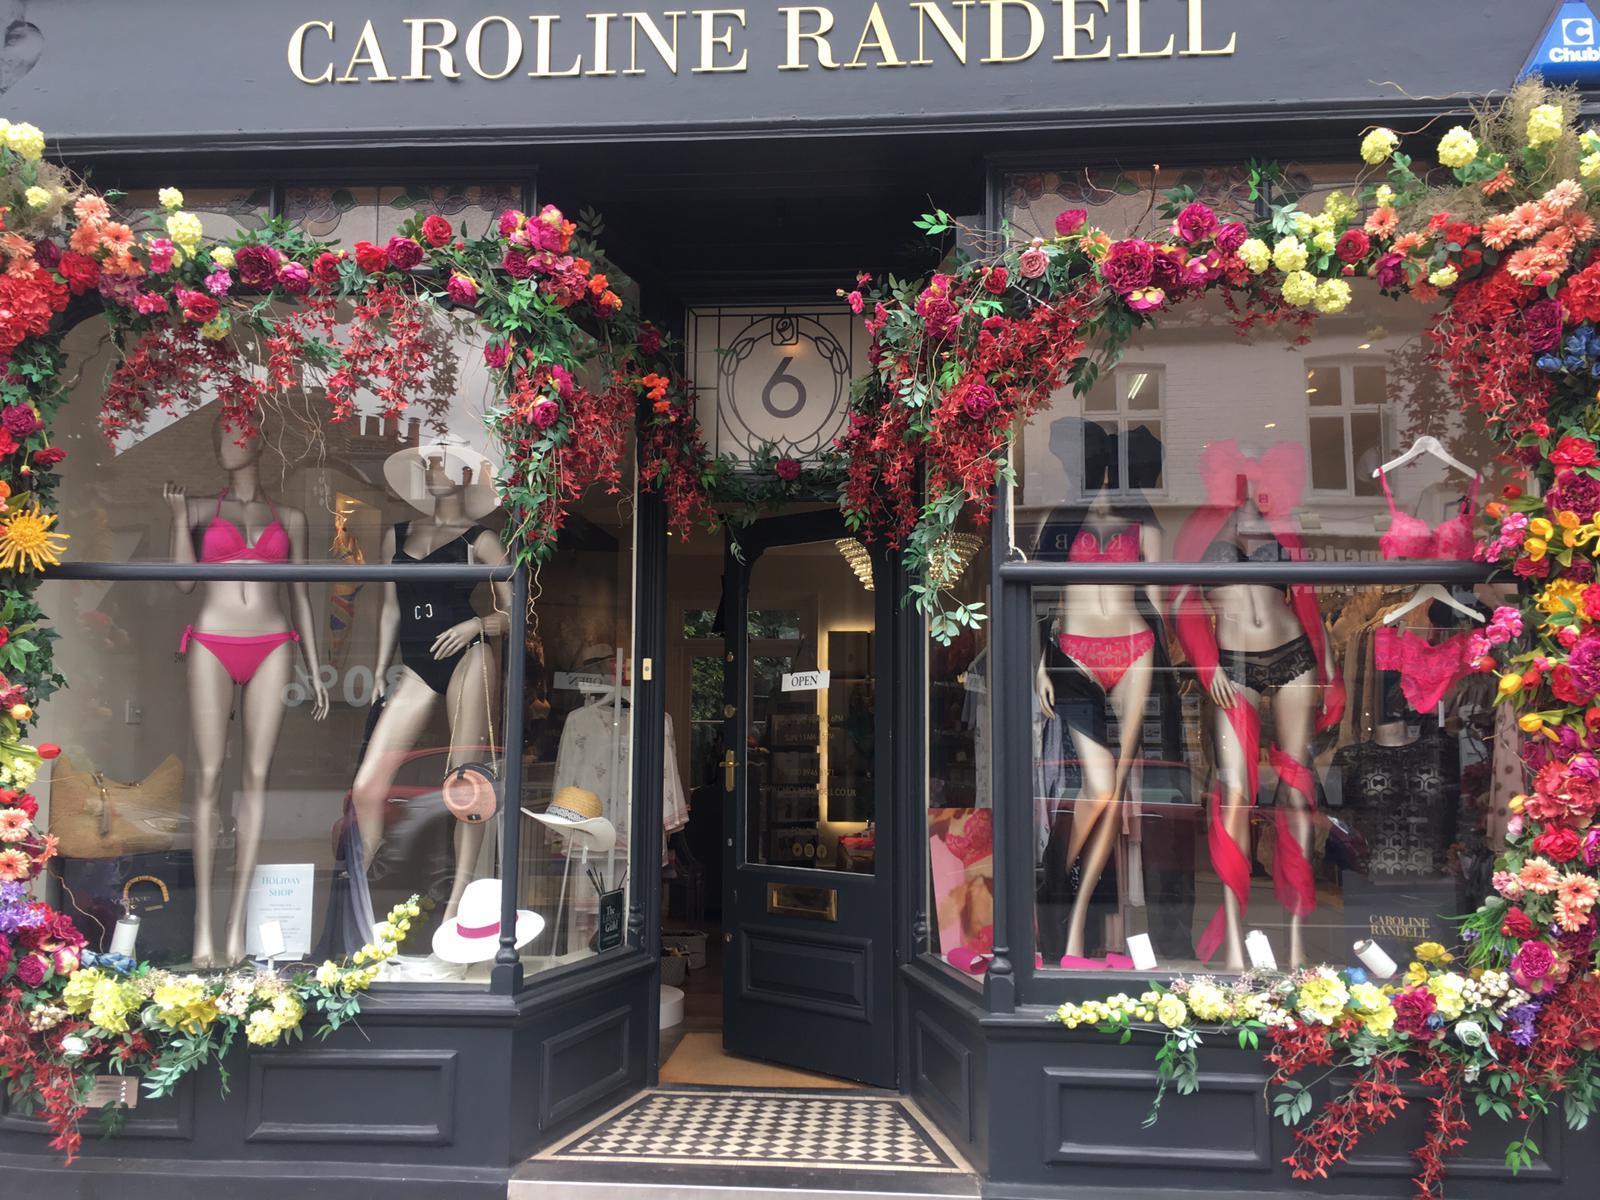 Caroline Randell Lingerie Boutique